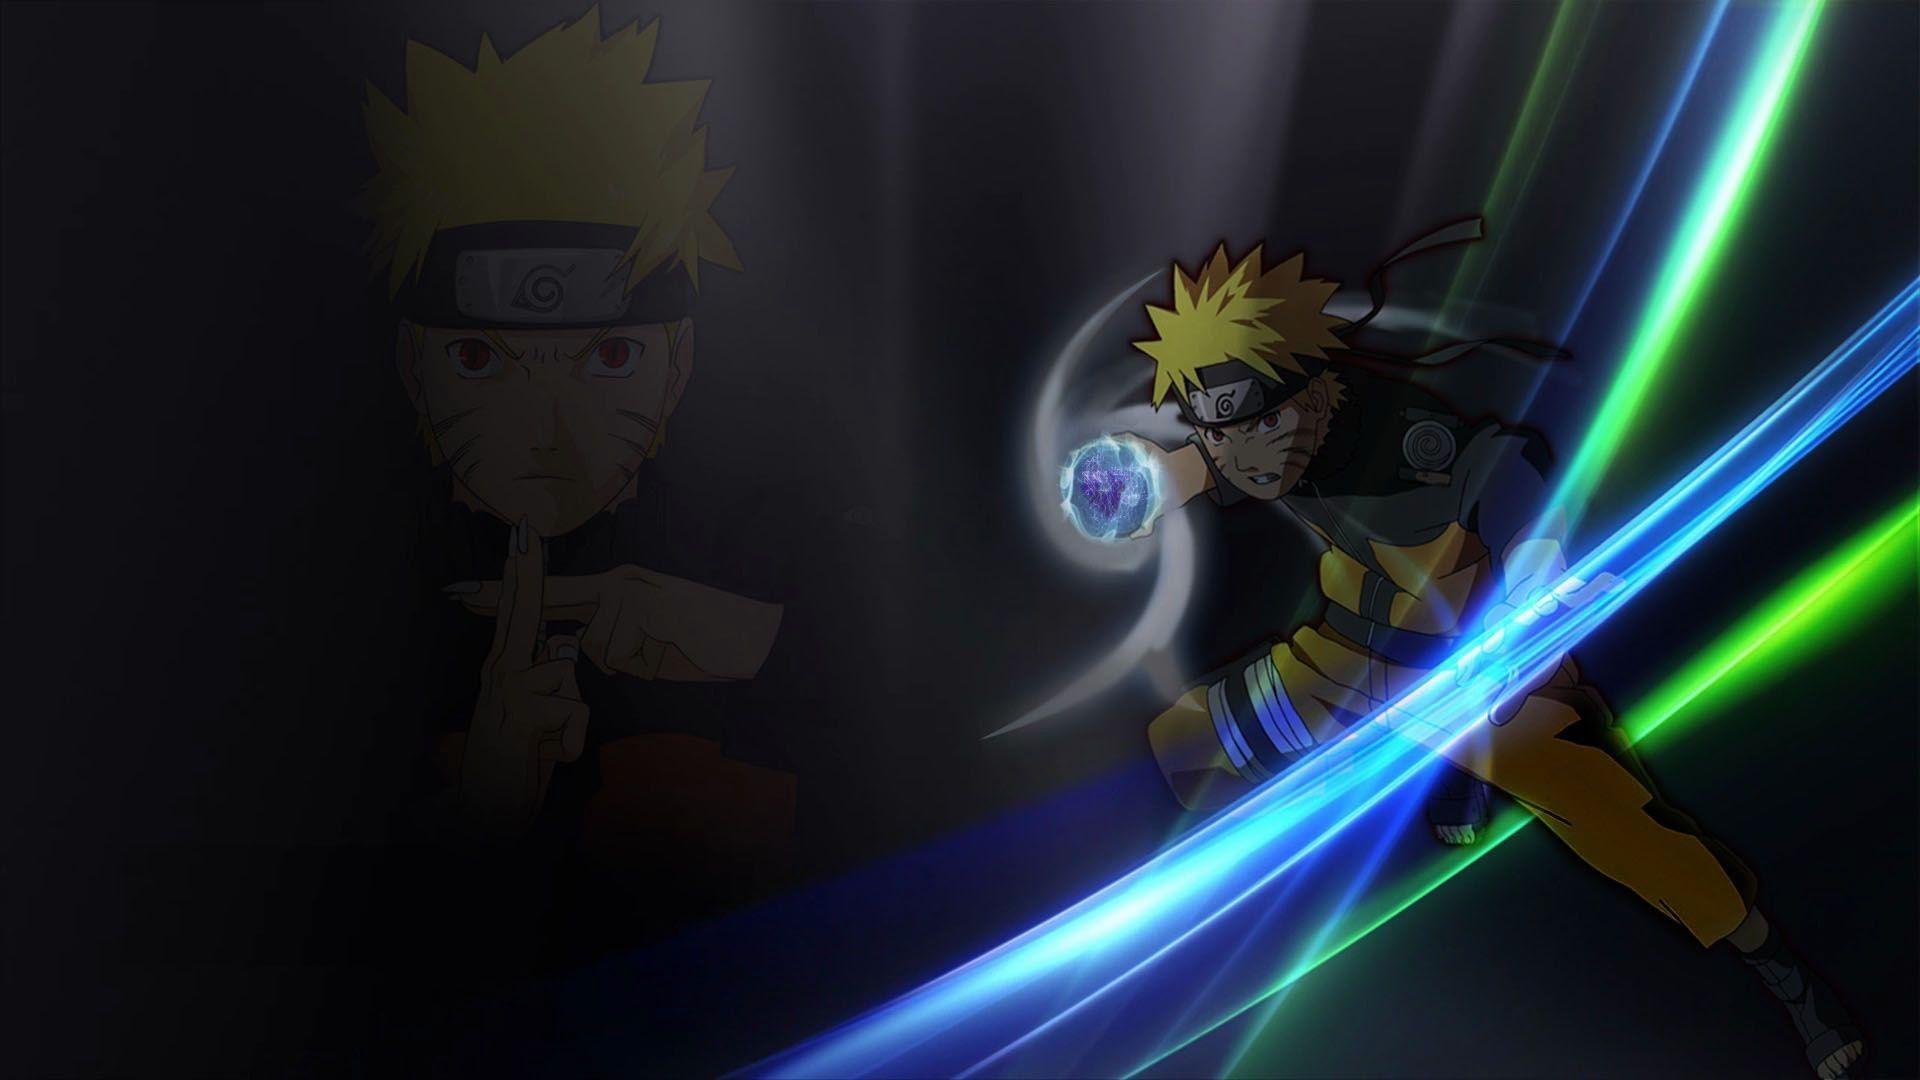 Lovely Cool Naruto Moving Pictures Wallpaper Naruto Animasi Gambar